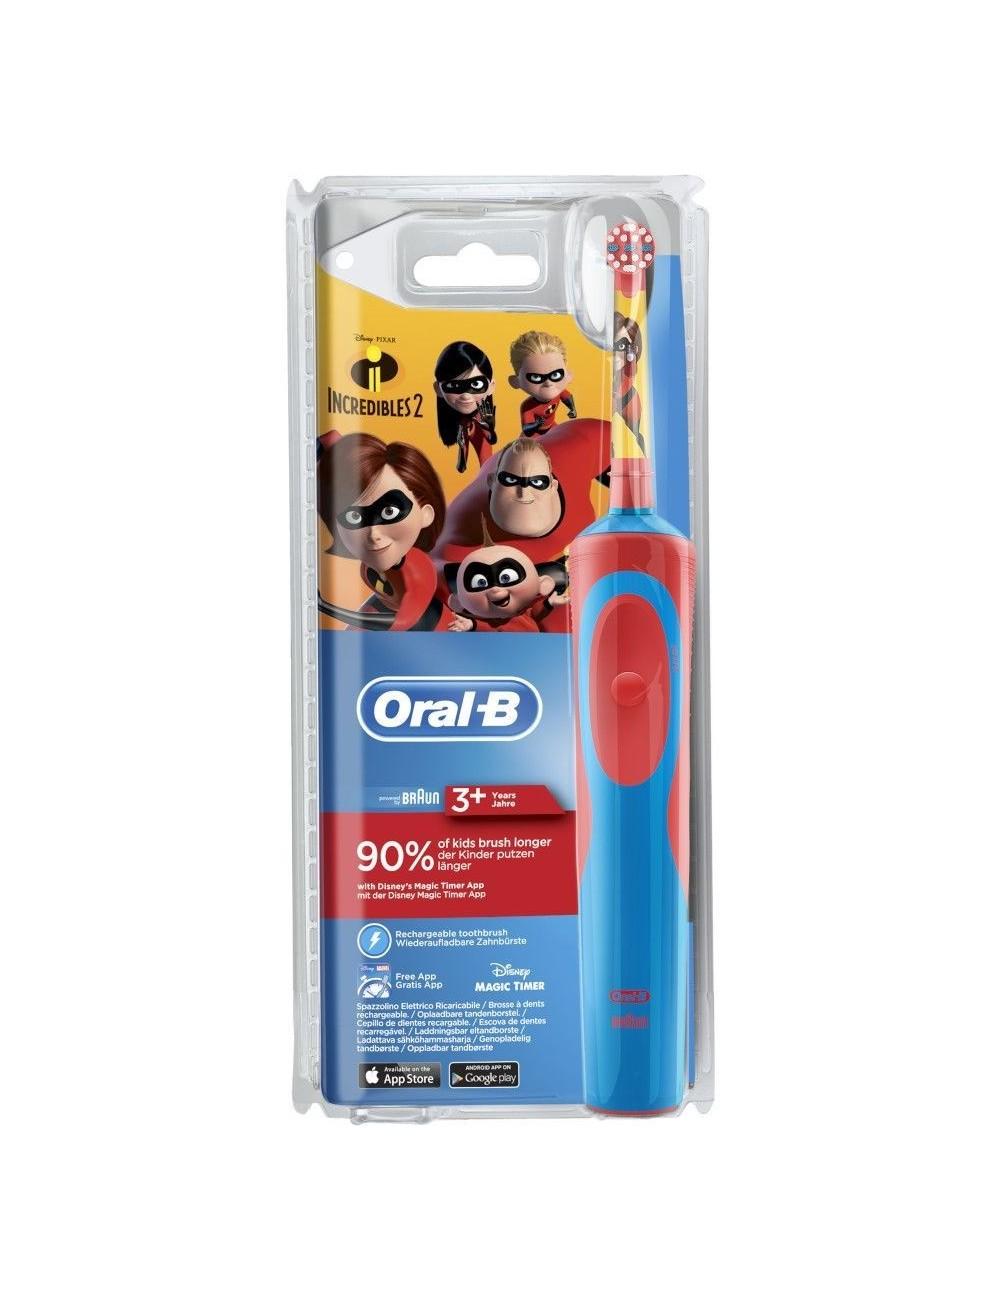 Cepillo de dientes Oral-B Kids D12513 Los Increíbles 2 Blister